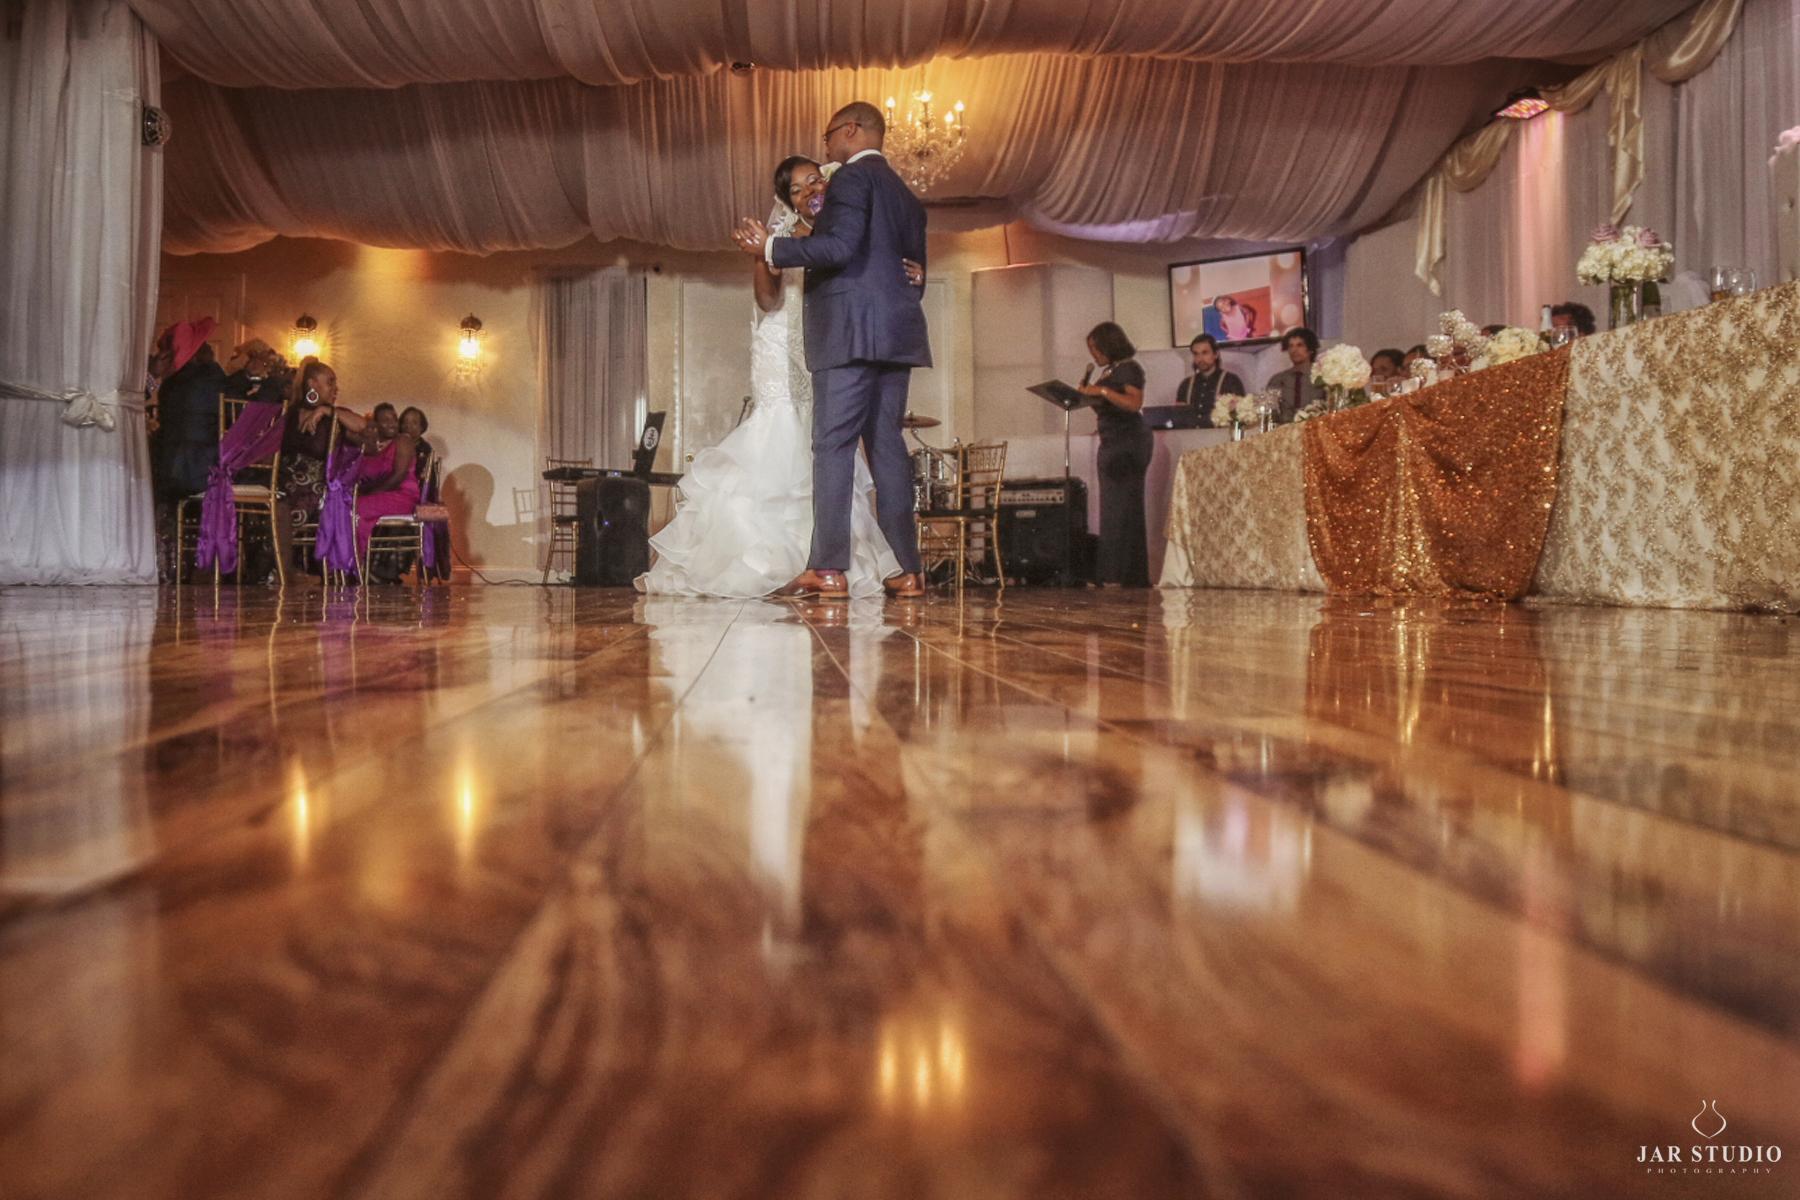 37-first-dance-Imperial Design Hall -jarstudio-wedding-photographer.JPG